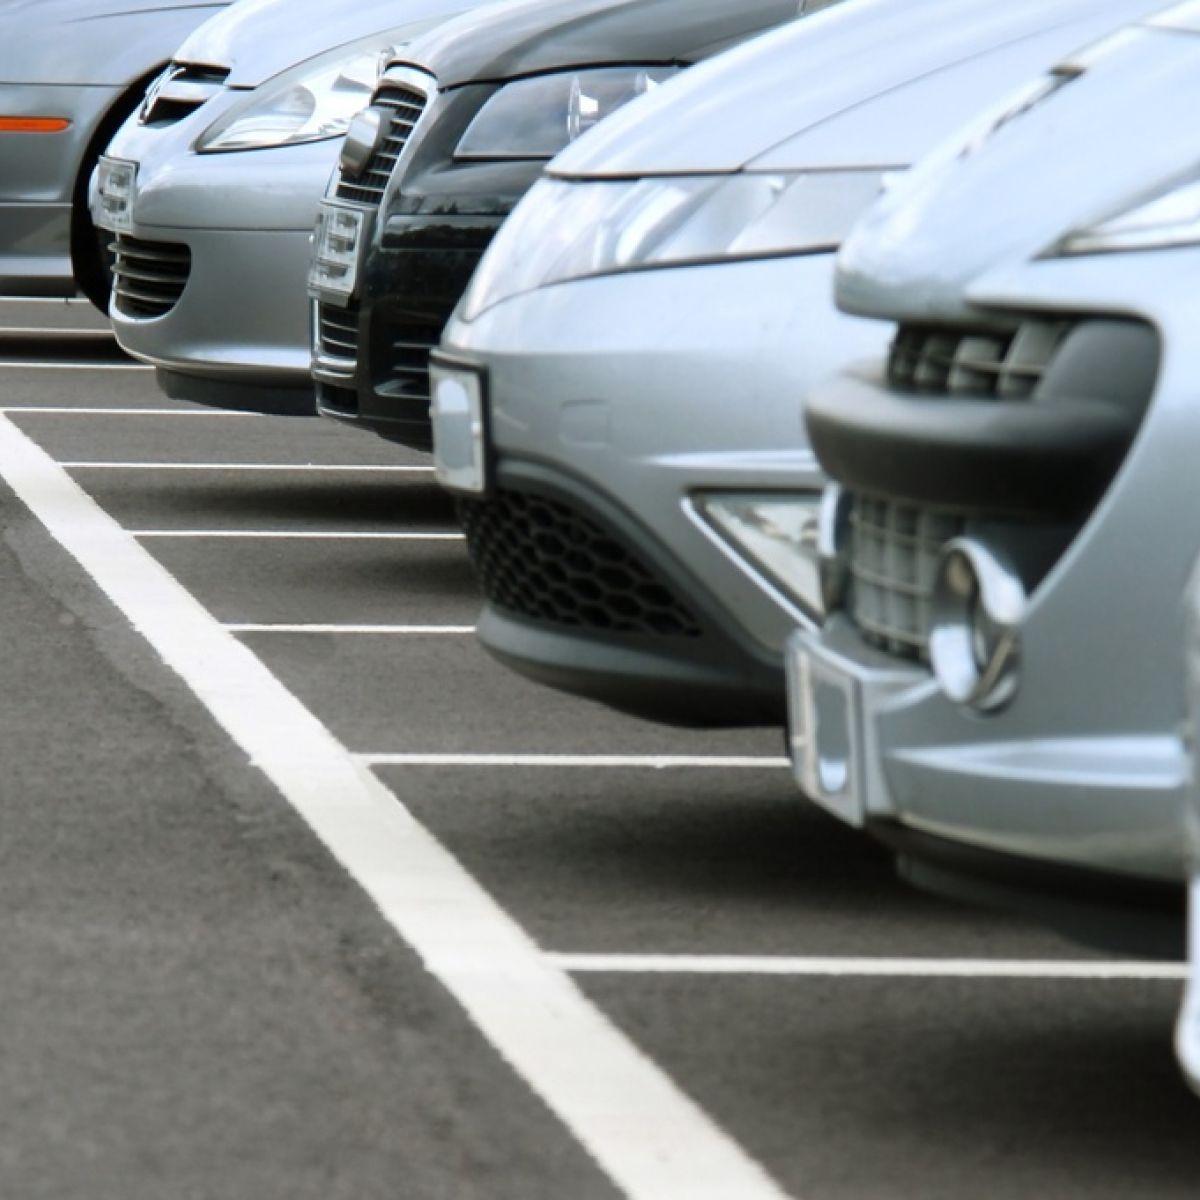 Irish Motorists Spending More On Uk Car Imports Report Finds